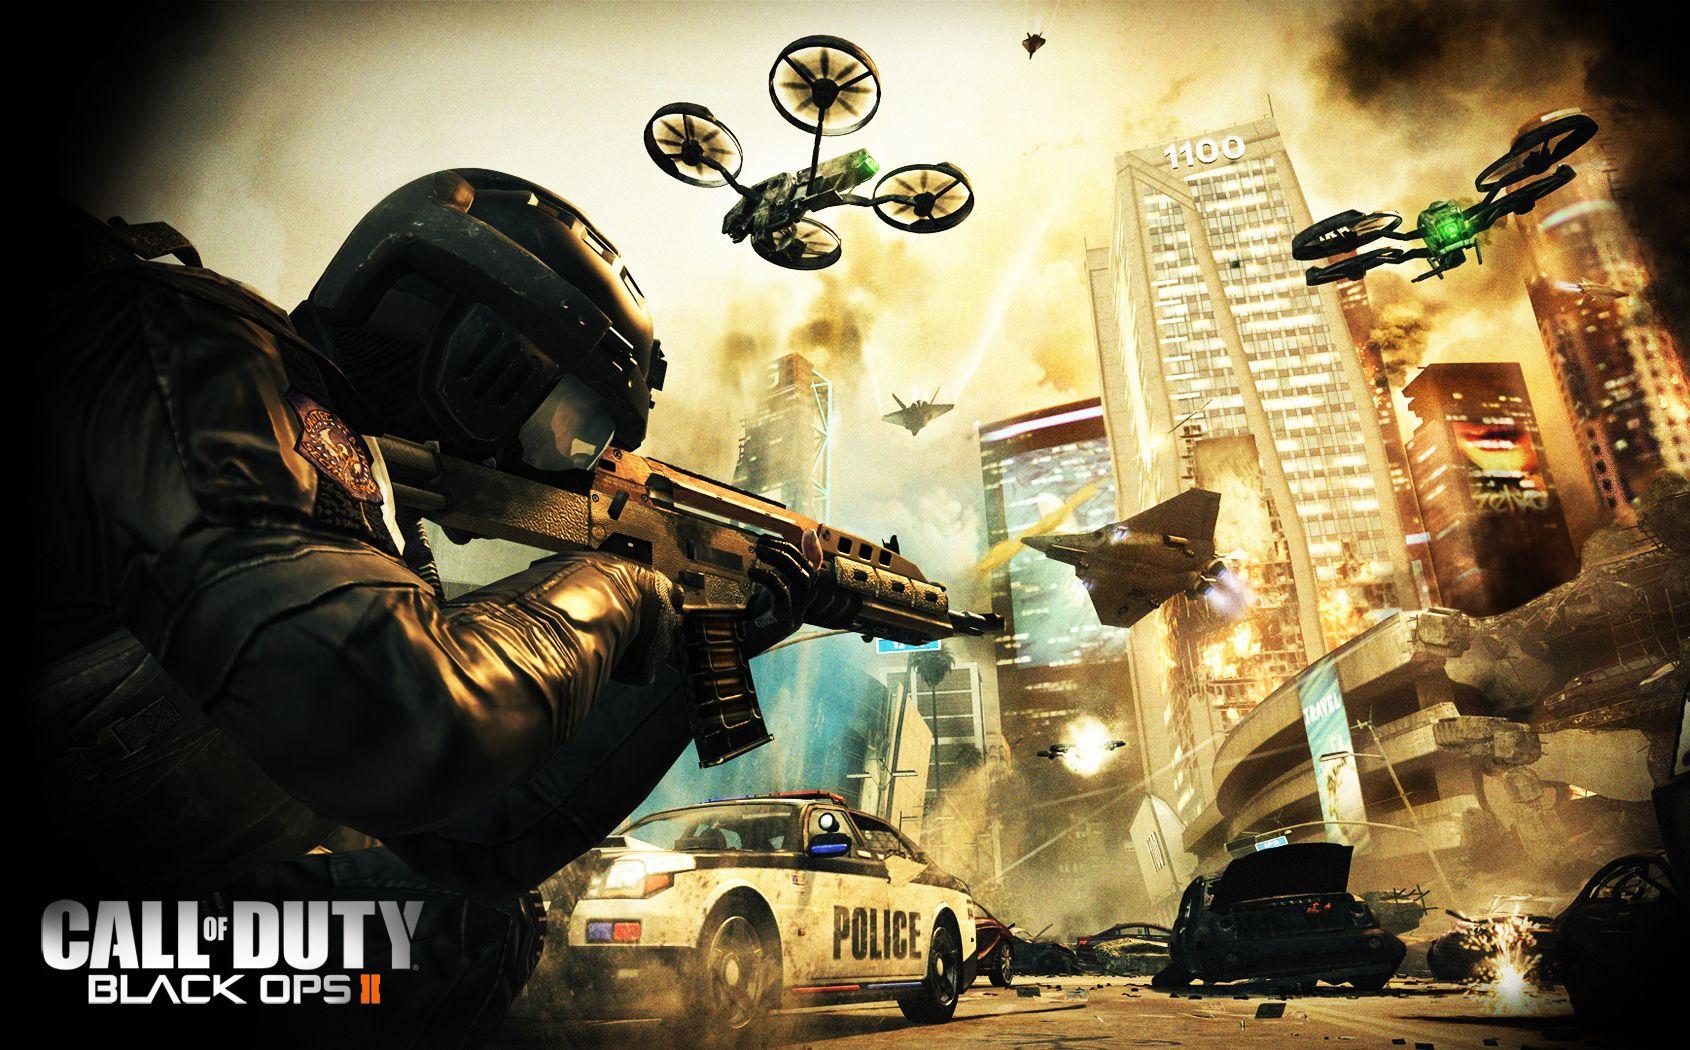 call of duty black ops 2 CALL OF DUTY BLACK OPS II